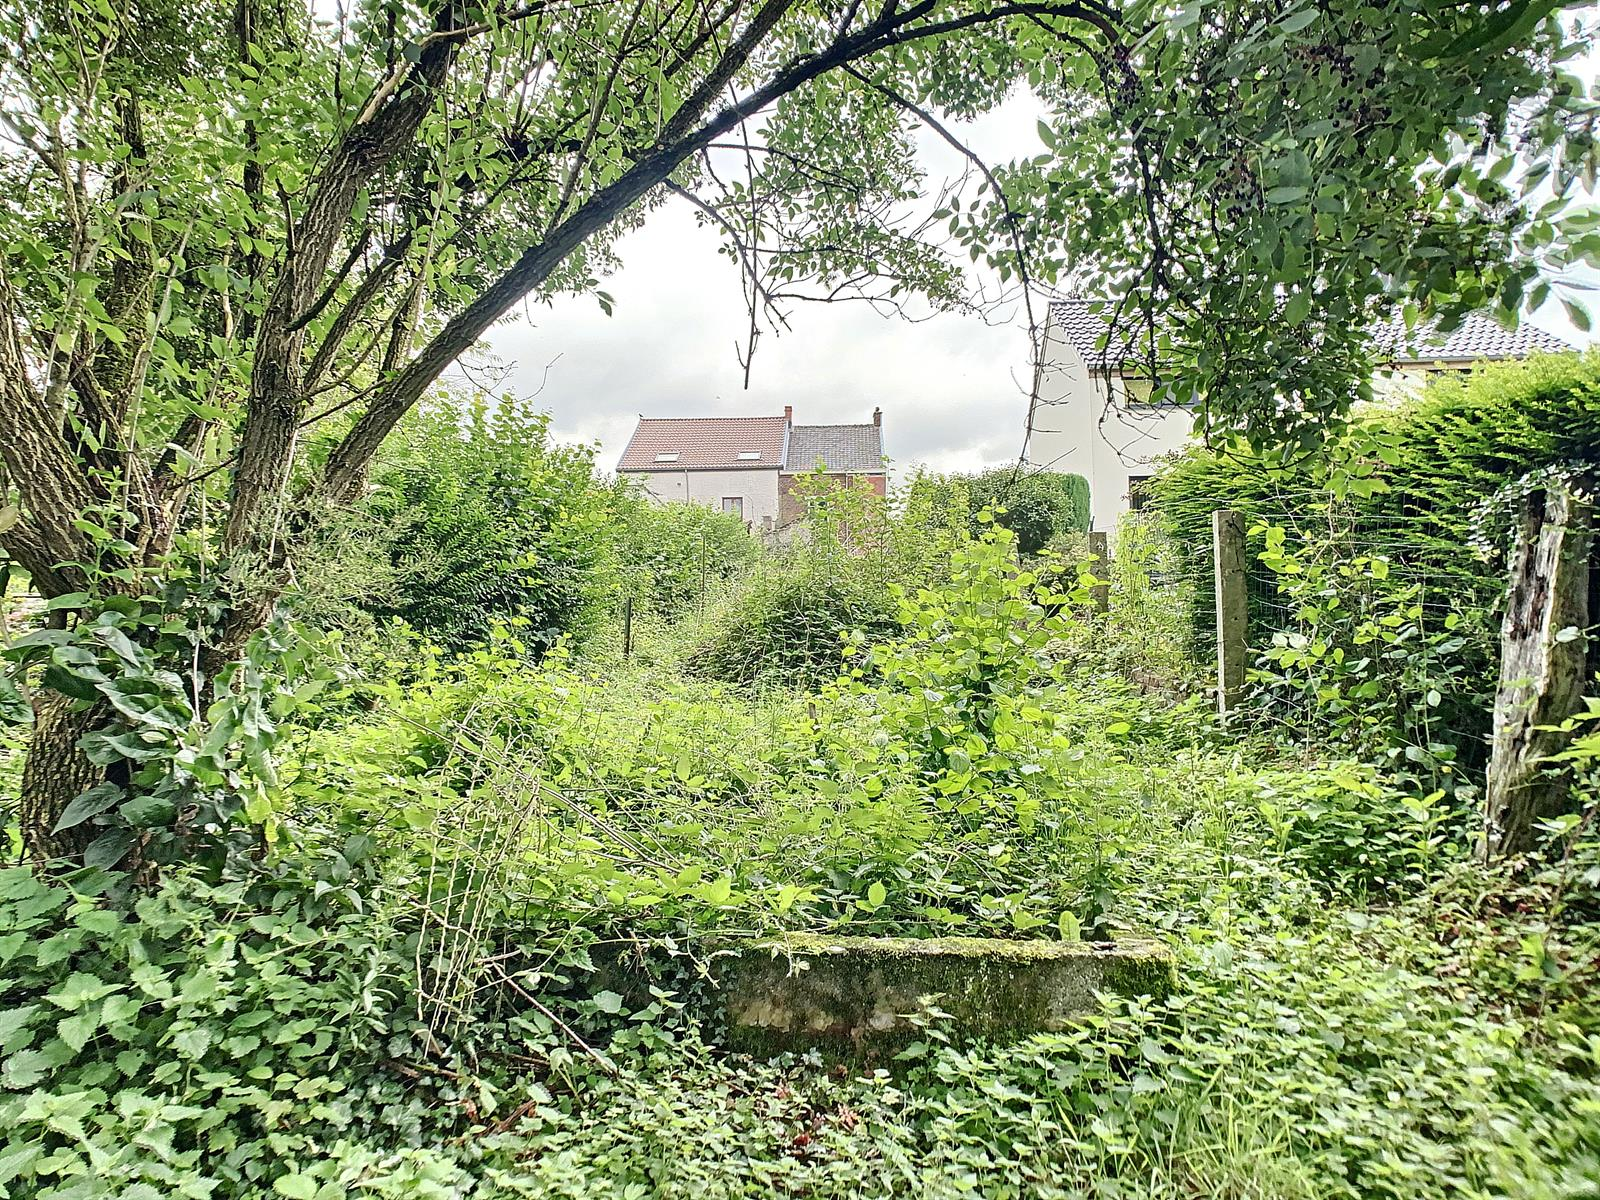 Maison - Charleroi Ransart - #4495773-14